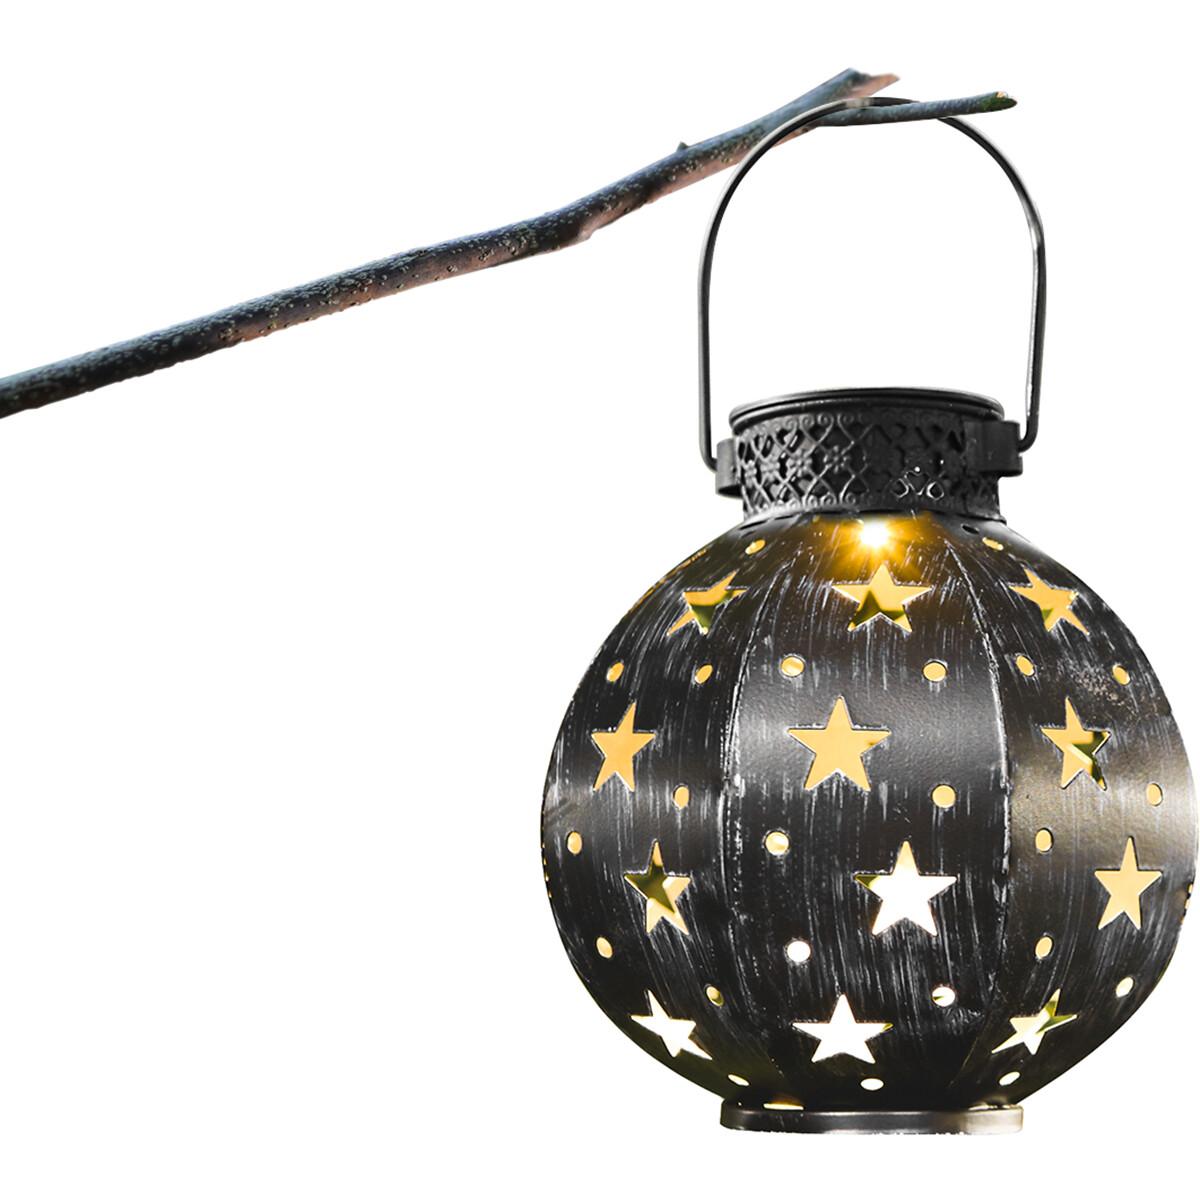 LED Hanglamp met Zonne-energie - Aigi Uki - 0.16W - Warm Wit 3000K - Mat Zwart - Kunststof